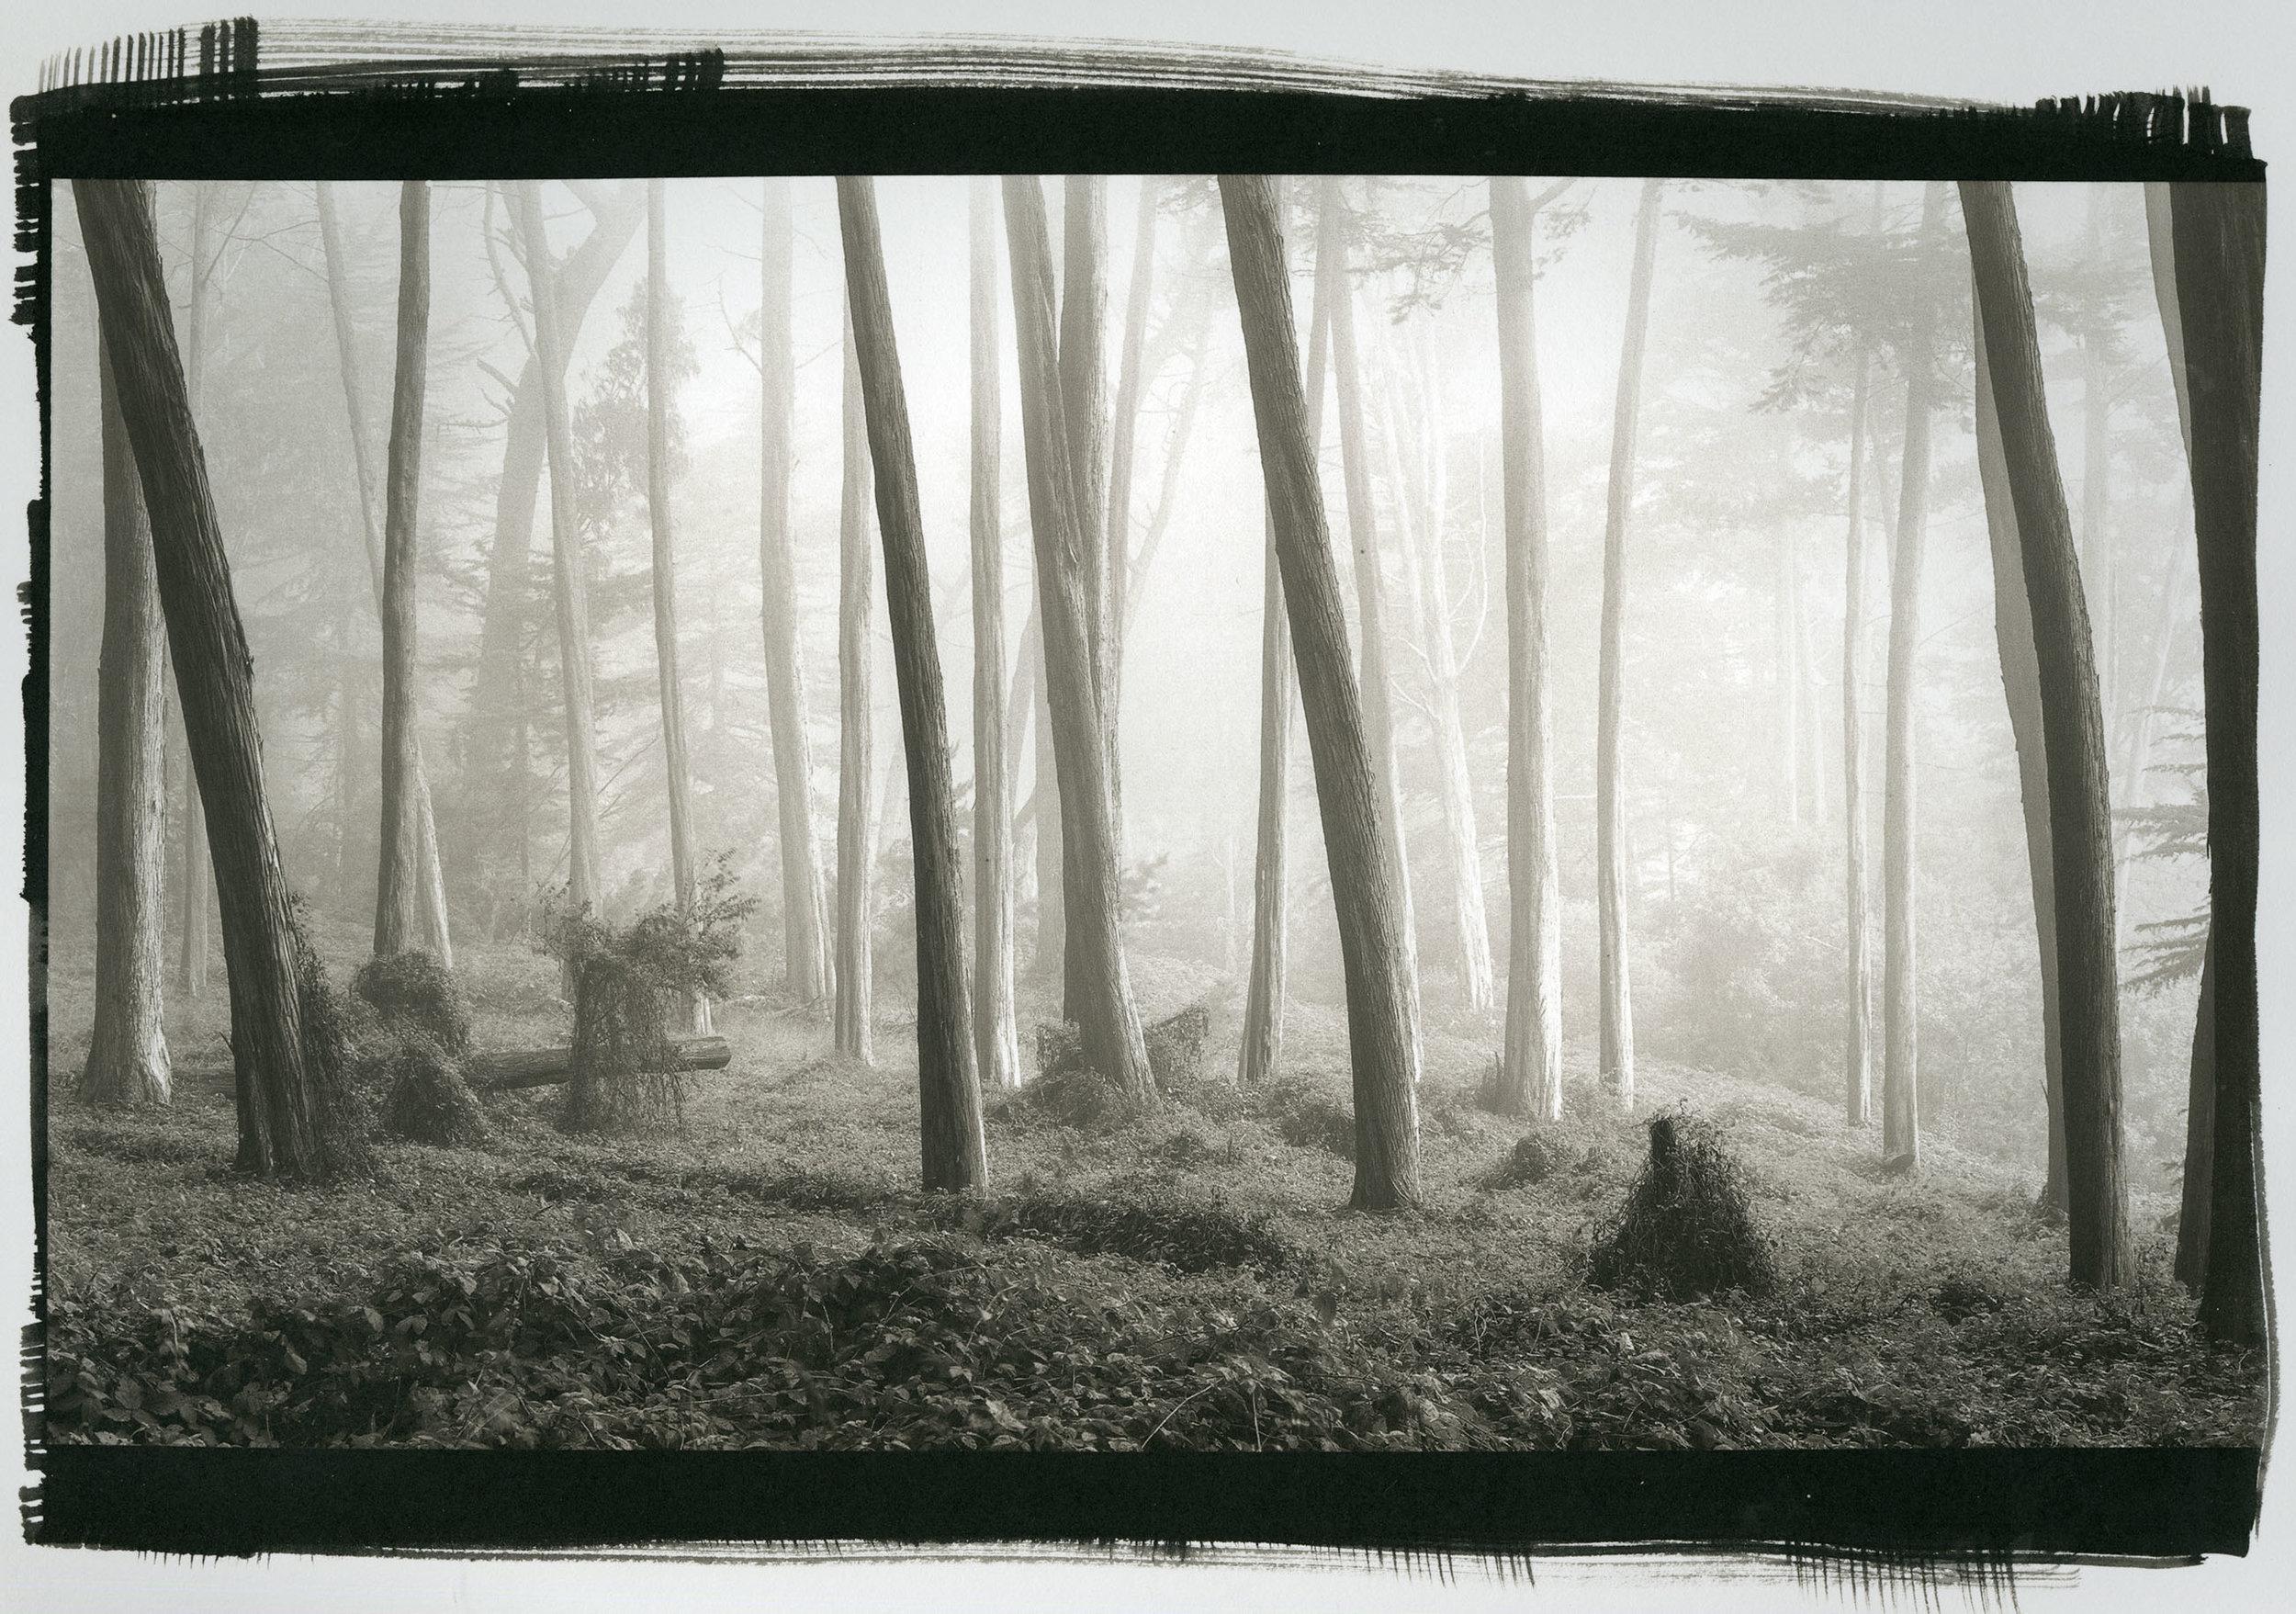 "Trees and Ivy No.1 (Platinum/Palladium Print, 8"" x 14"")"